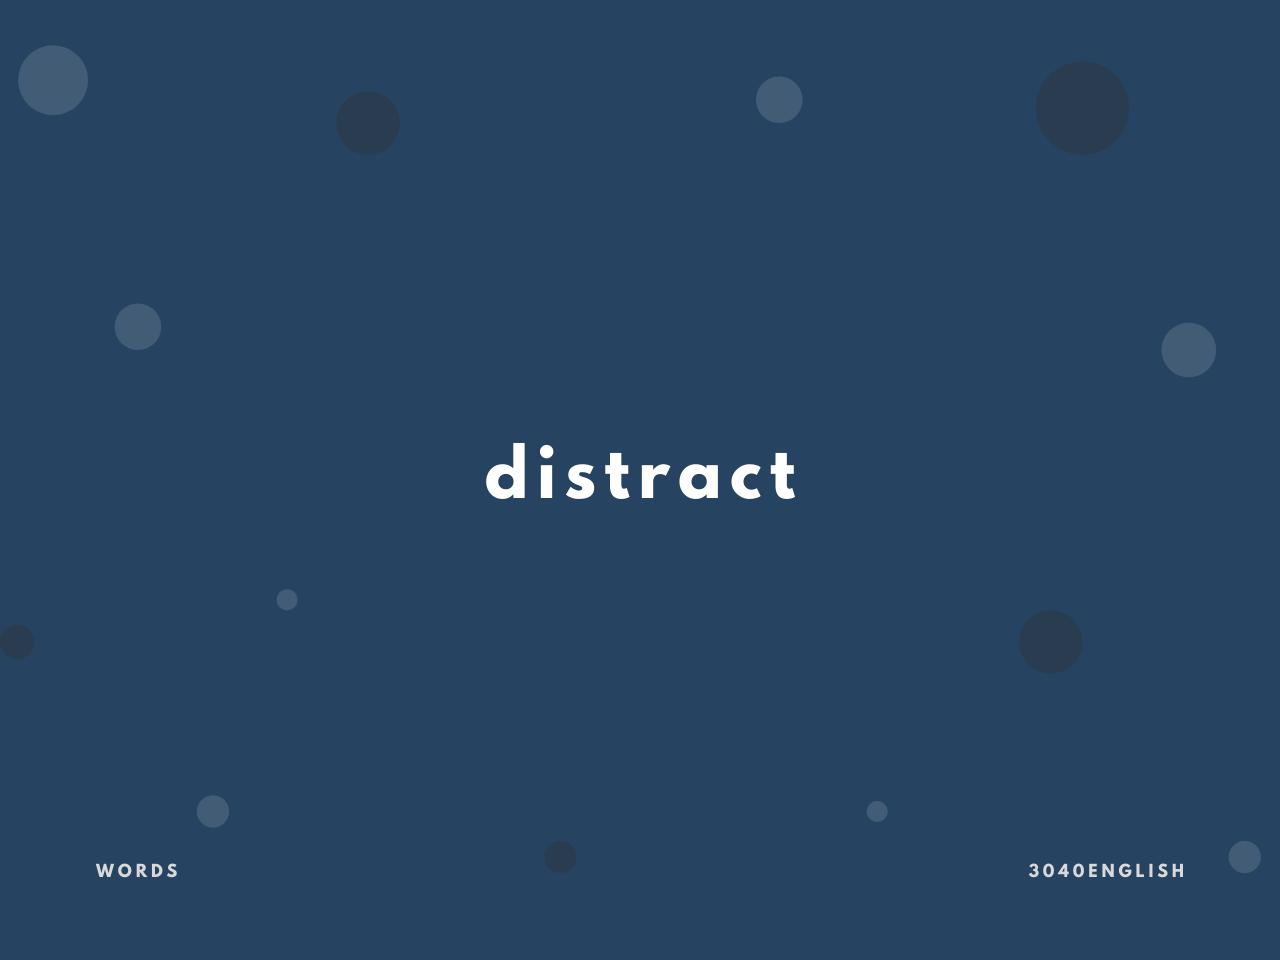 distract の意味と簡単な使い方【音読用例文あり】